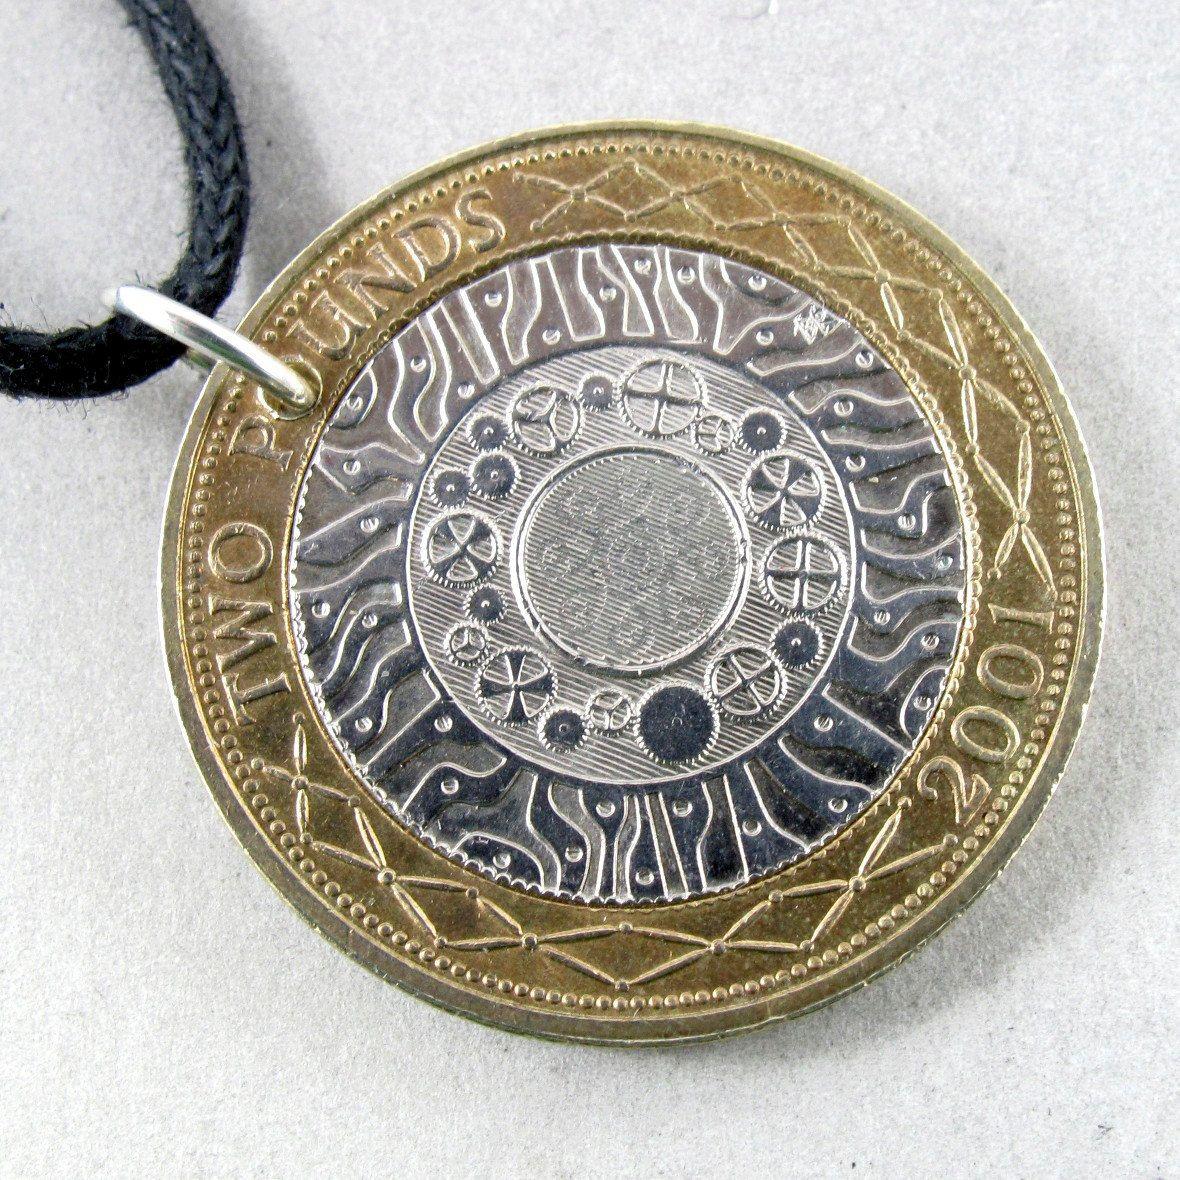 Celtic England Coin Necklace Uk Coin Pendant Charm 2 Etsy Coin Necklace Coin Jewelry Coin Pendant